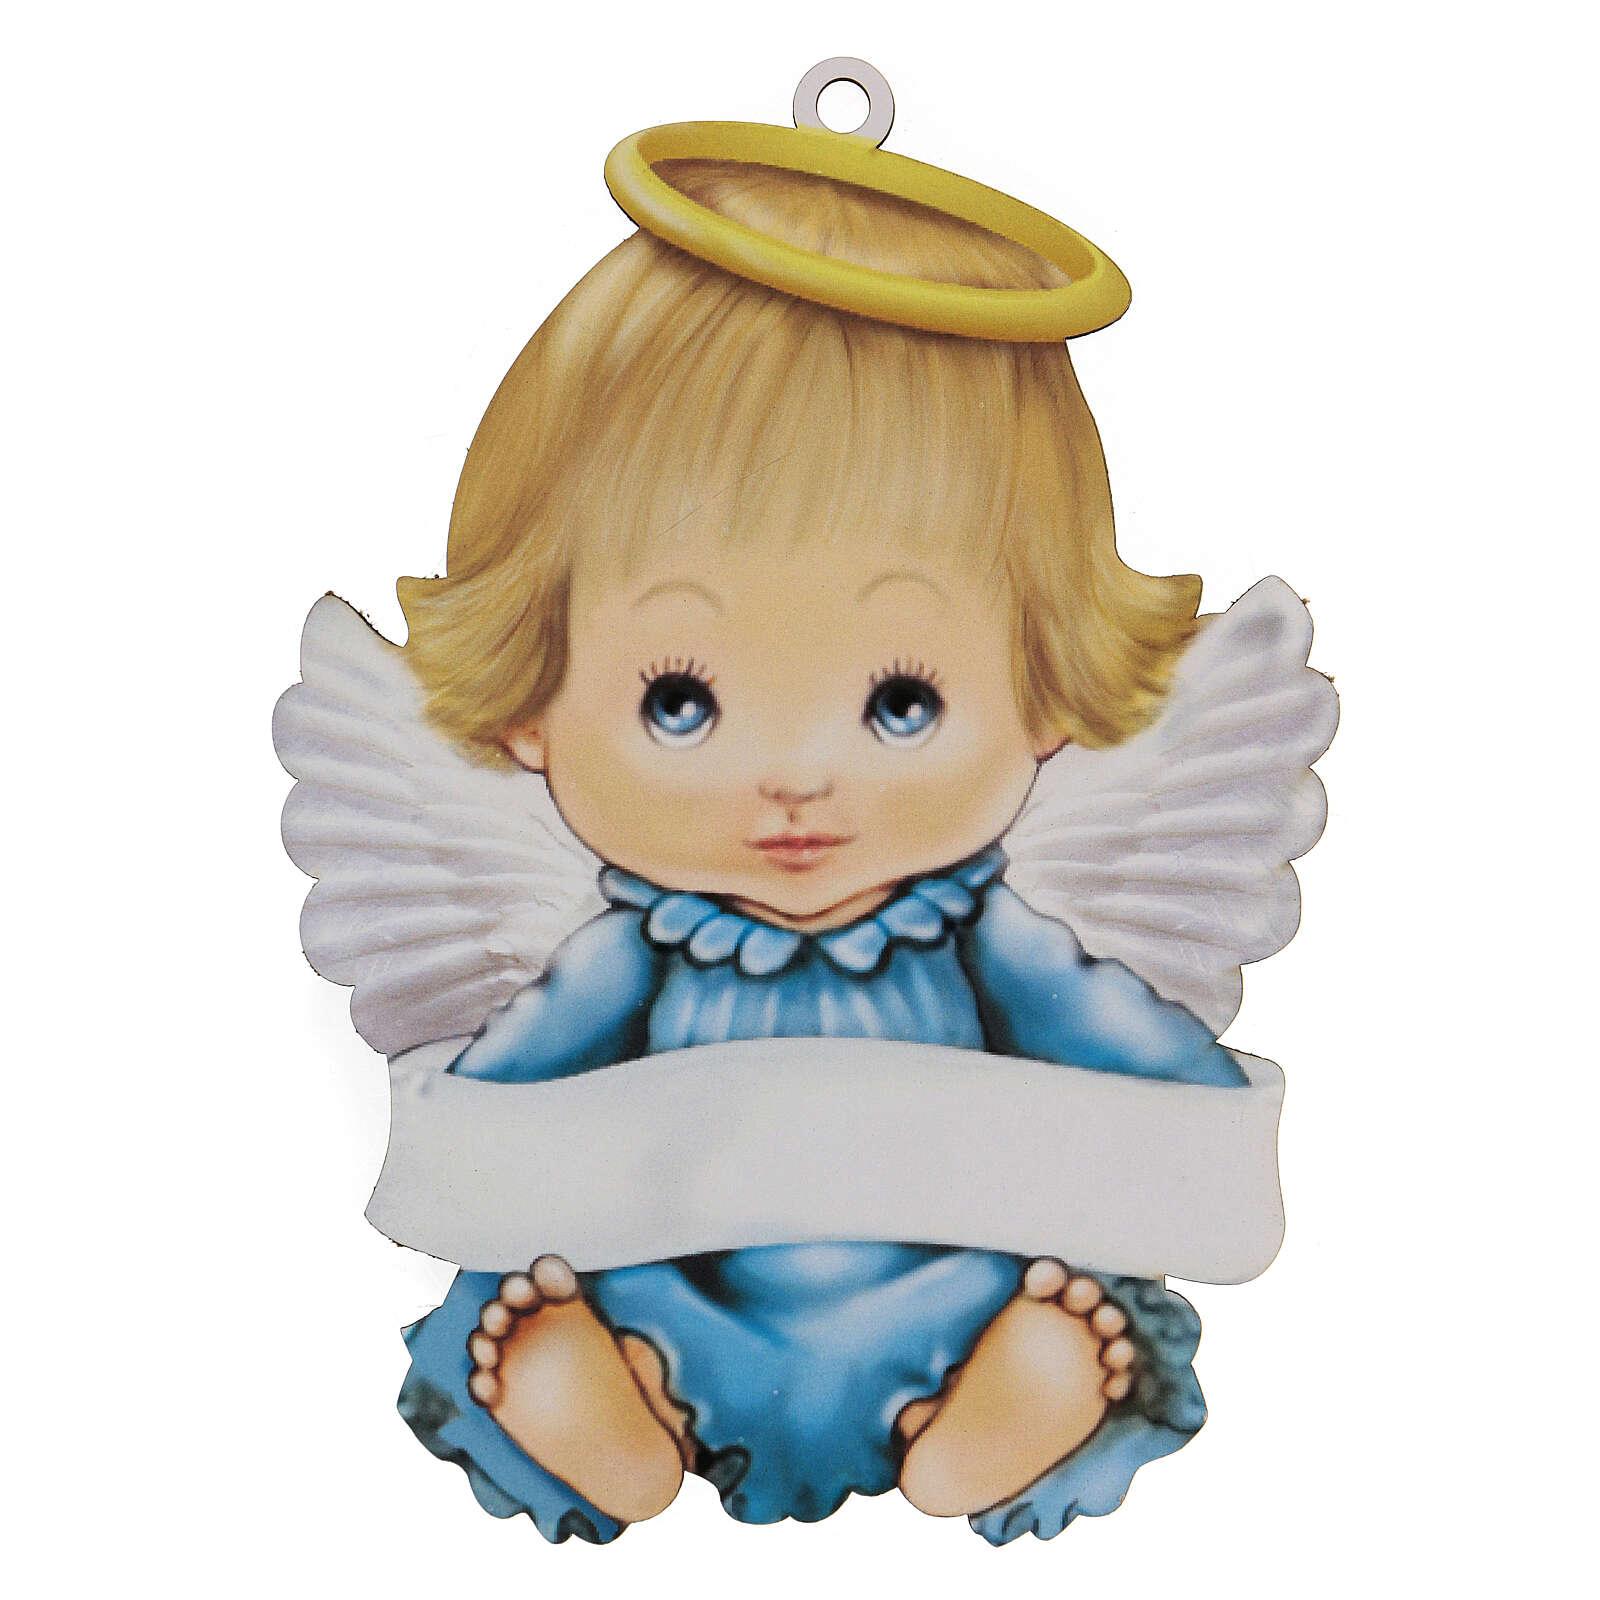 Recuerdo Ángel niño 20 cm 3